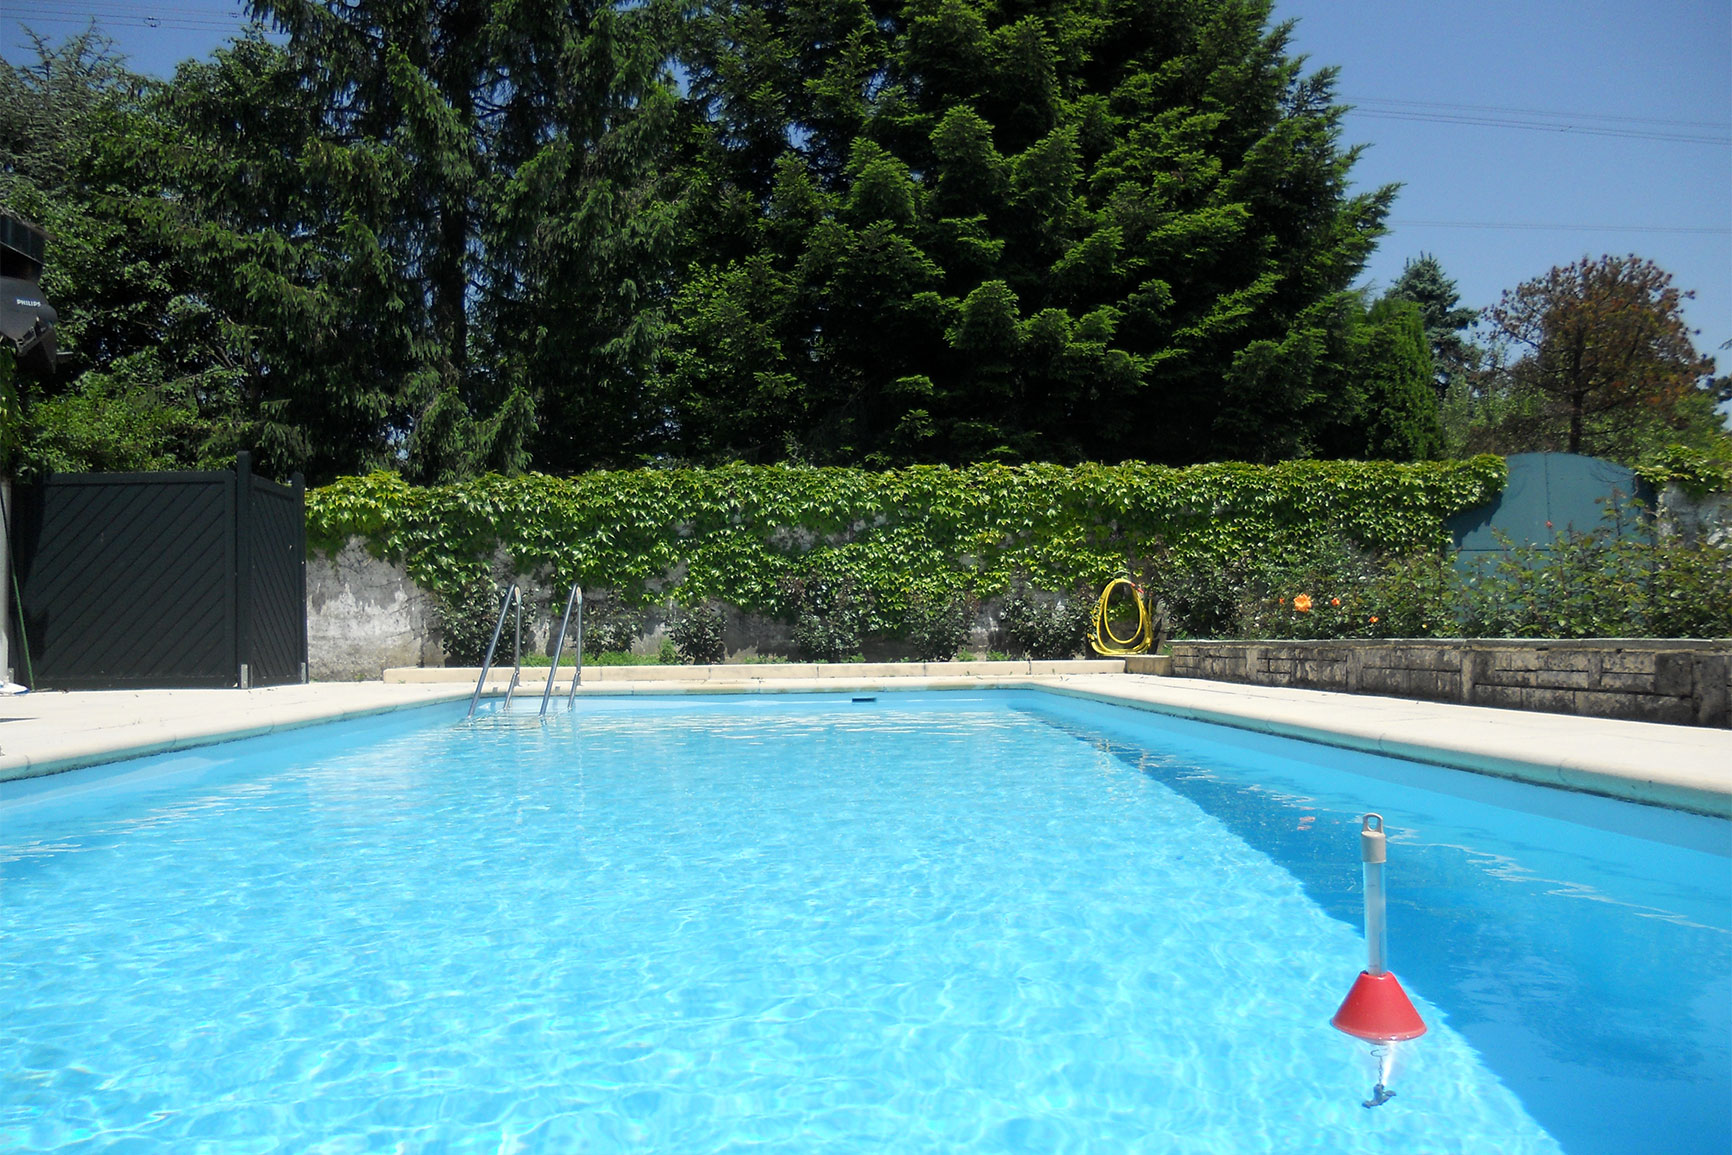 Classique polyester piscines widmer for Chavannes piscine